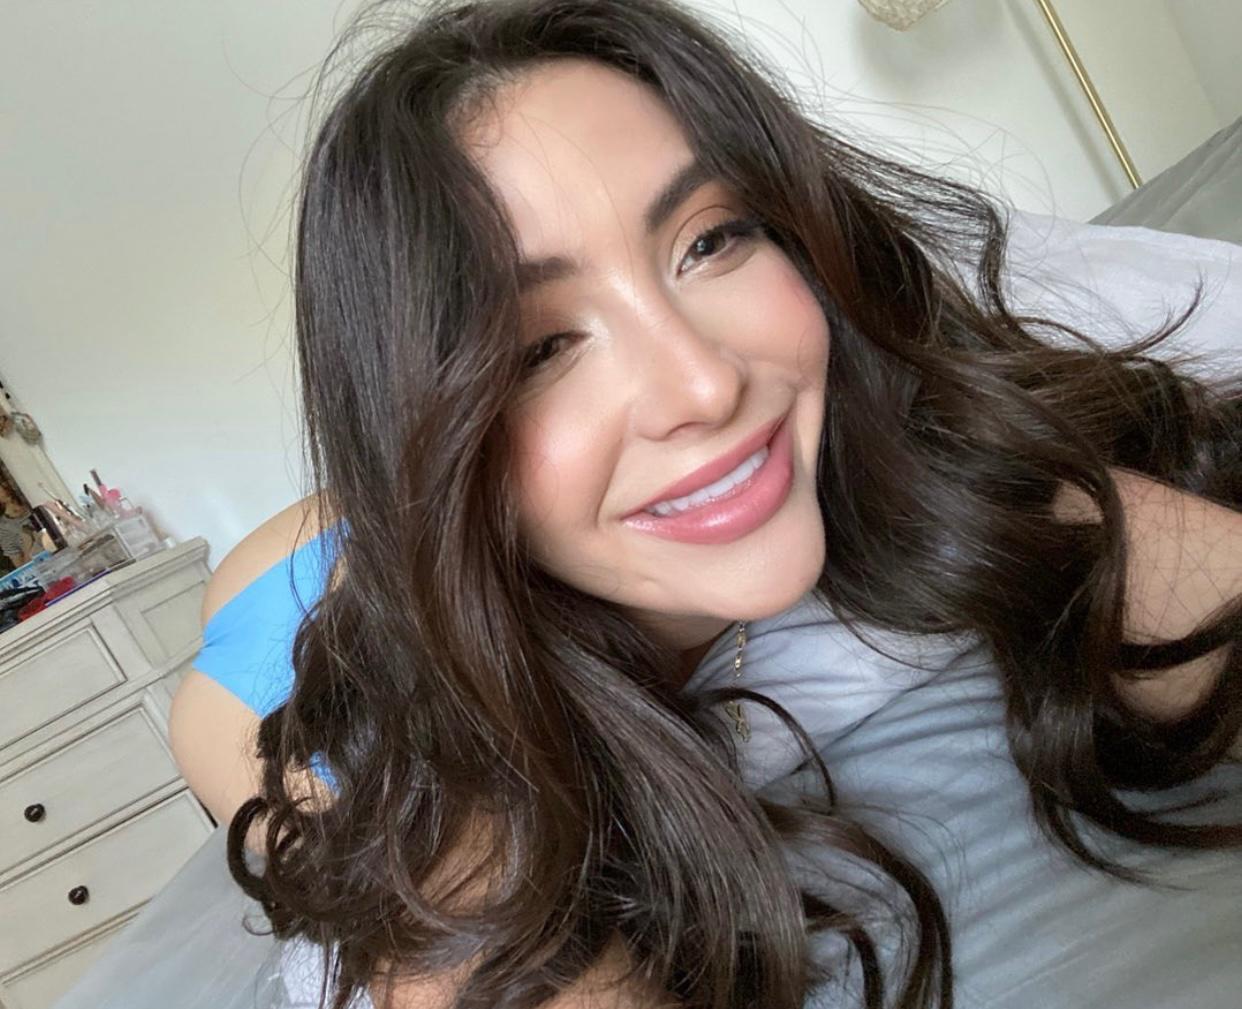 100% REAL💕✨PRETTY WET GIRl READY TO FUCK whatsapp +1(805)475-3242